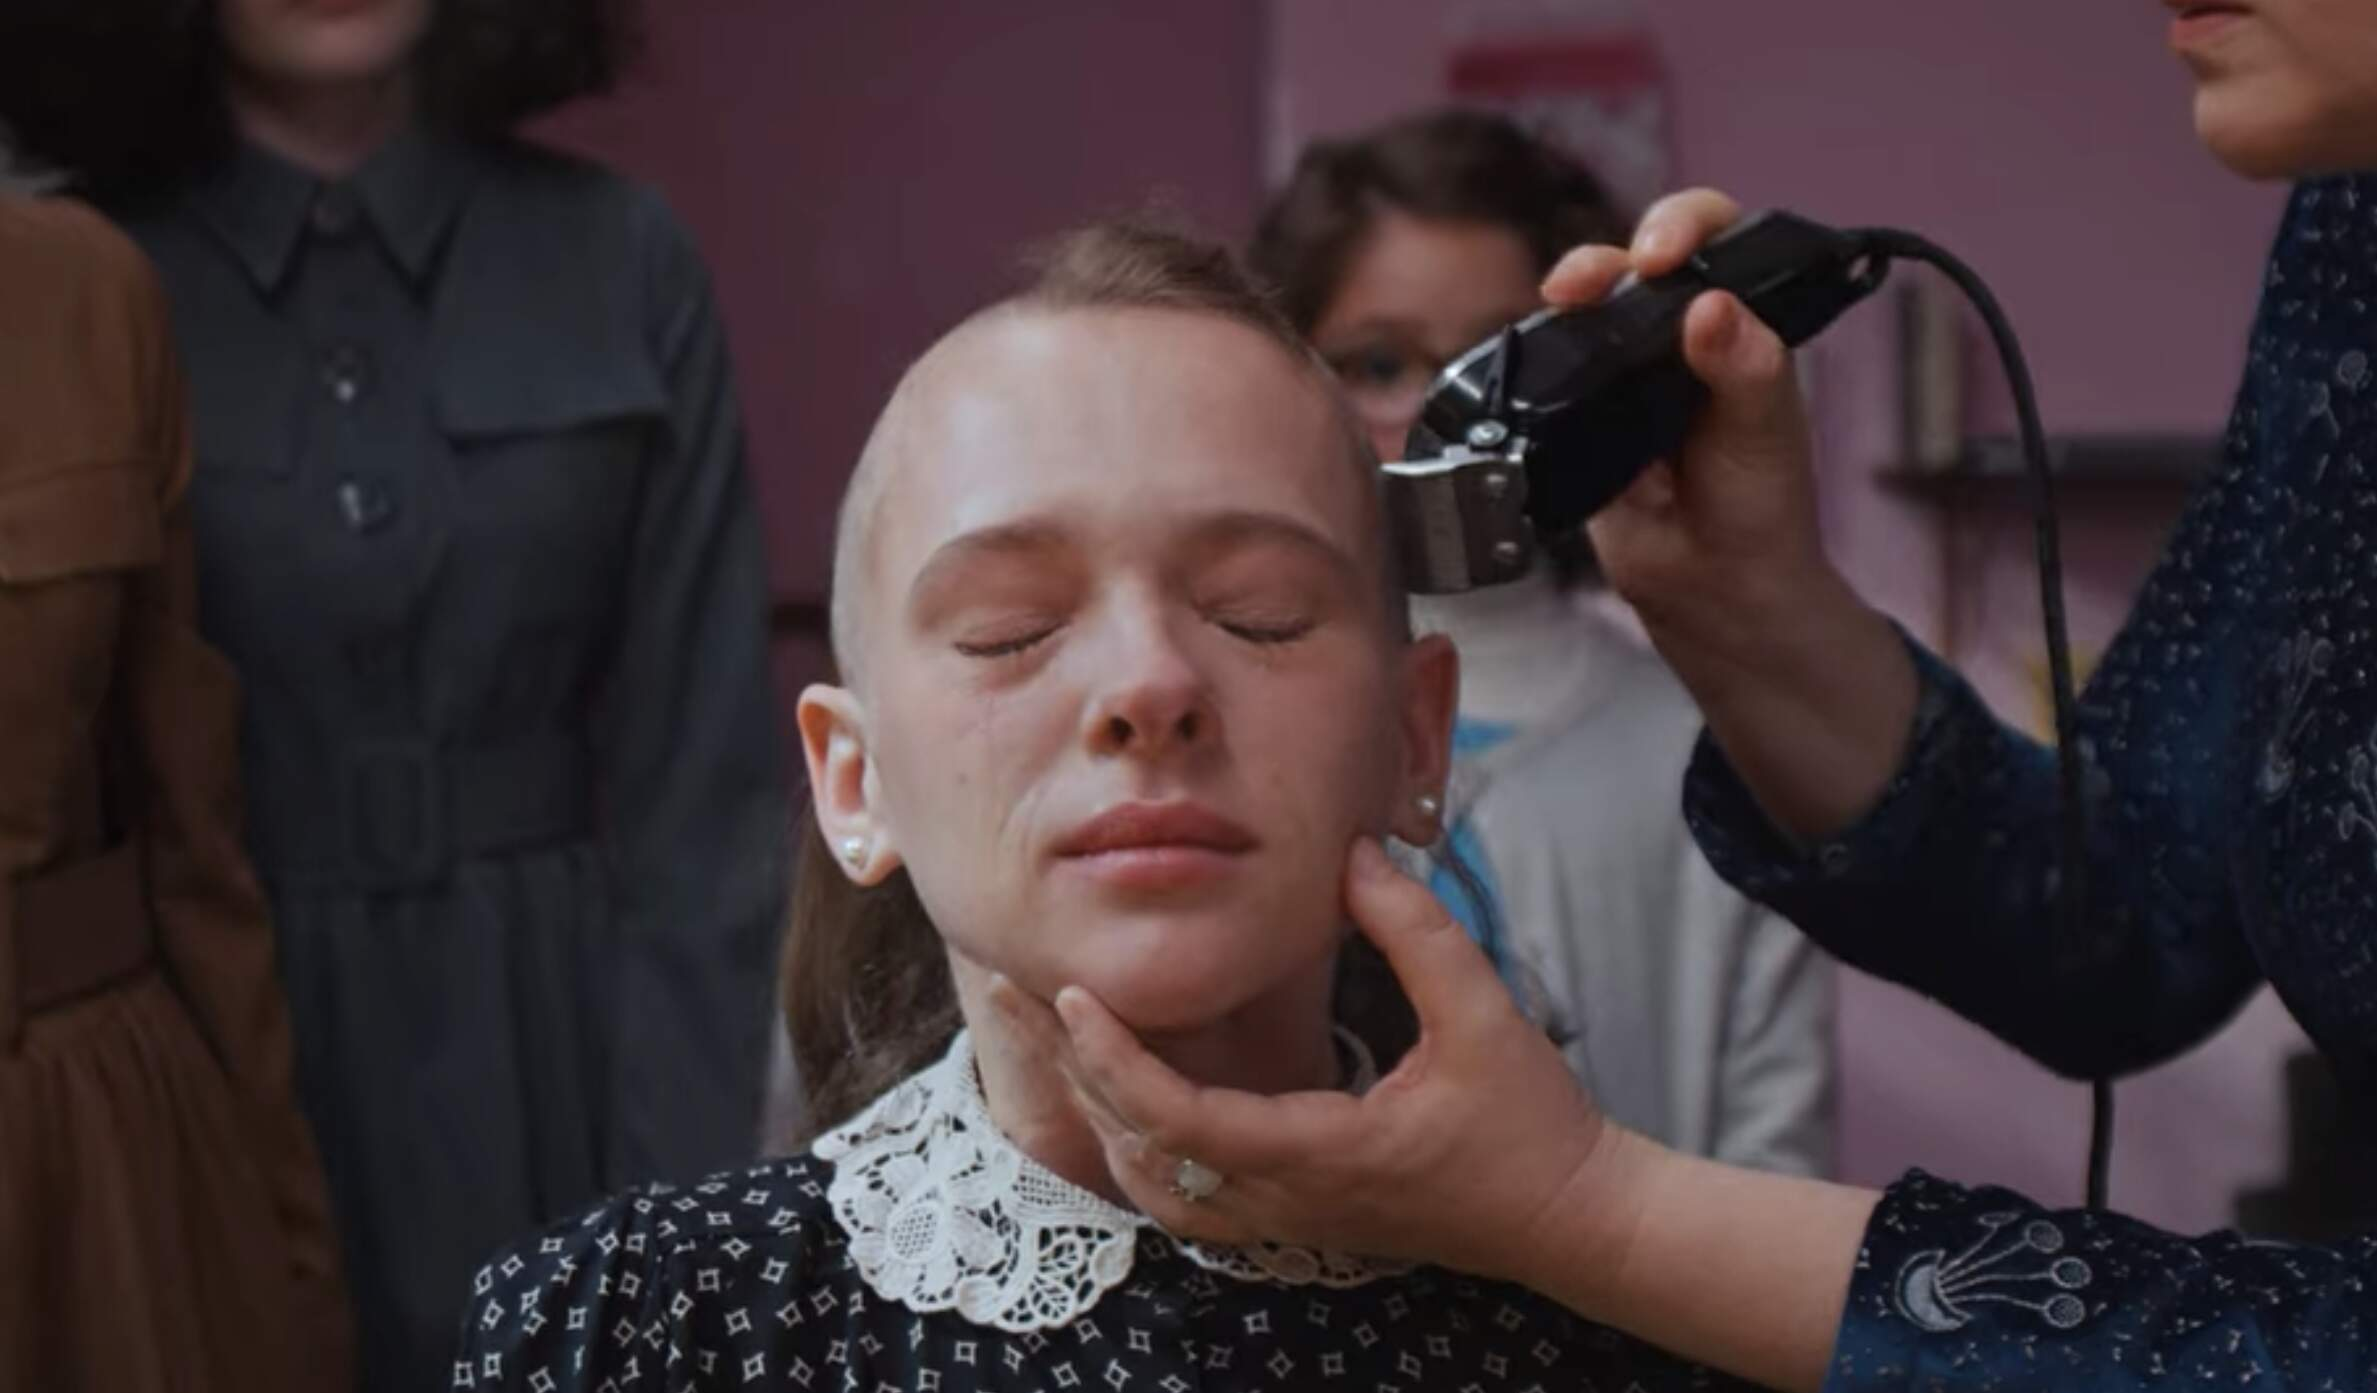 Неортодоксальная (2020) — Unorthodox сериал